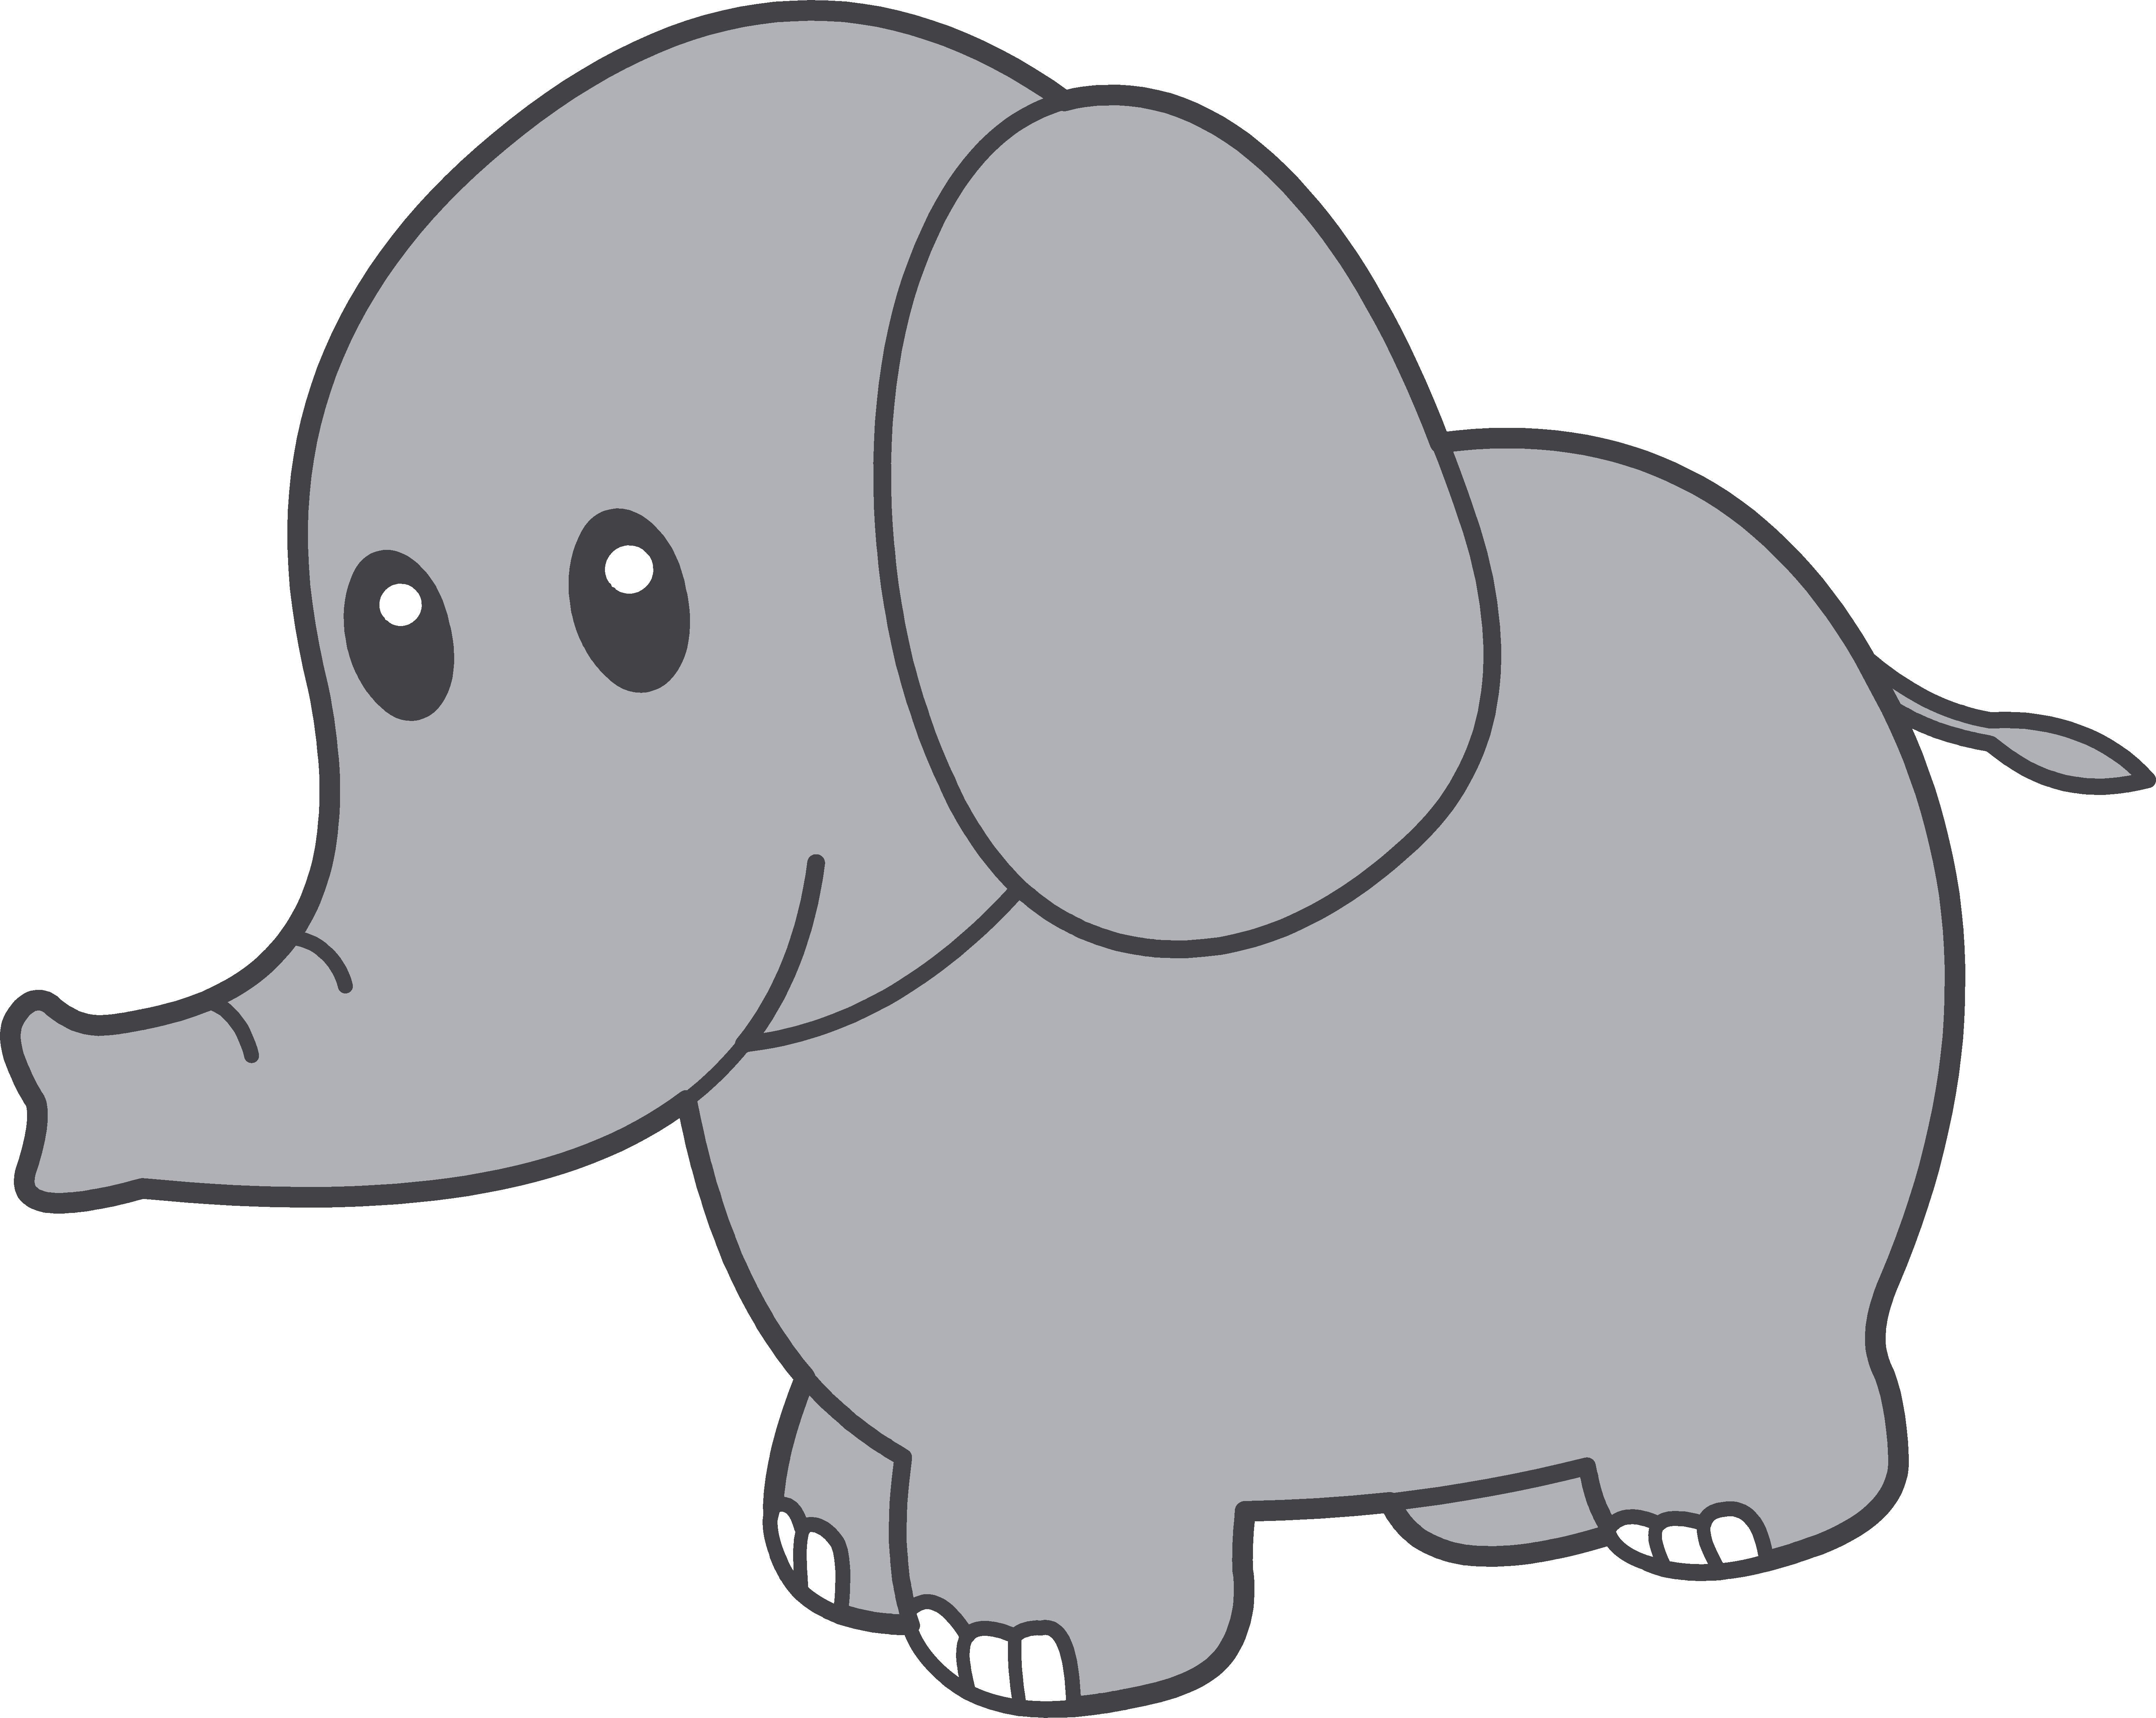 Cute elephant clipart free clipart images | My cricut | Pinterest ...